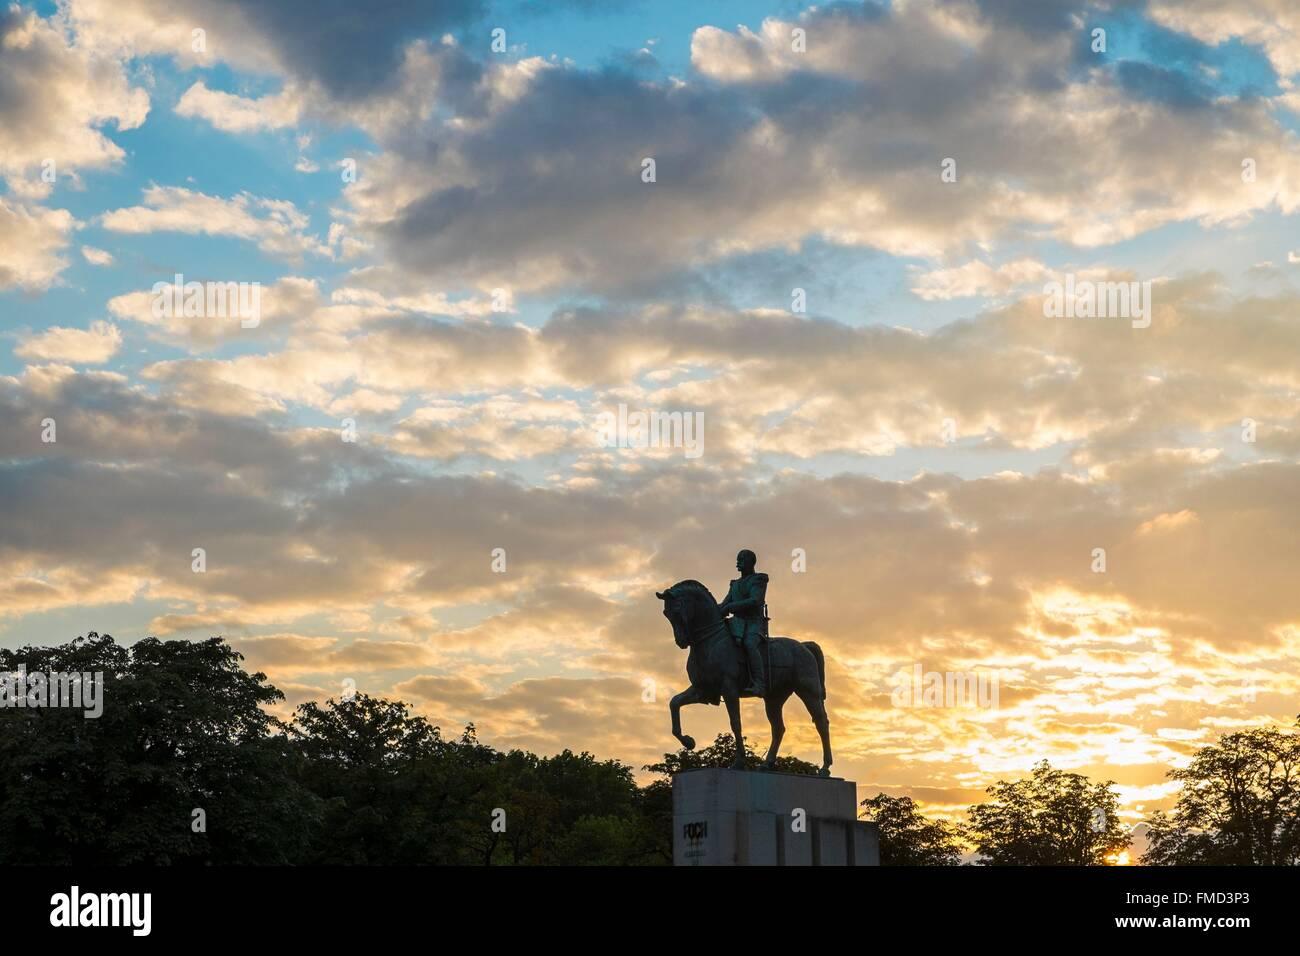 France, Paris, Trocadero Square, equestrian statue of Marshal Foch - Stock Image